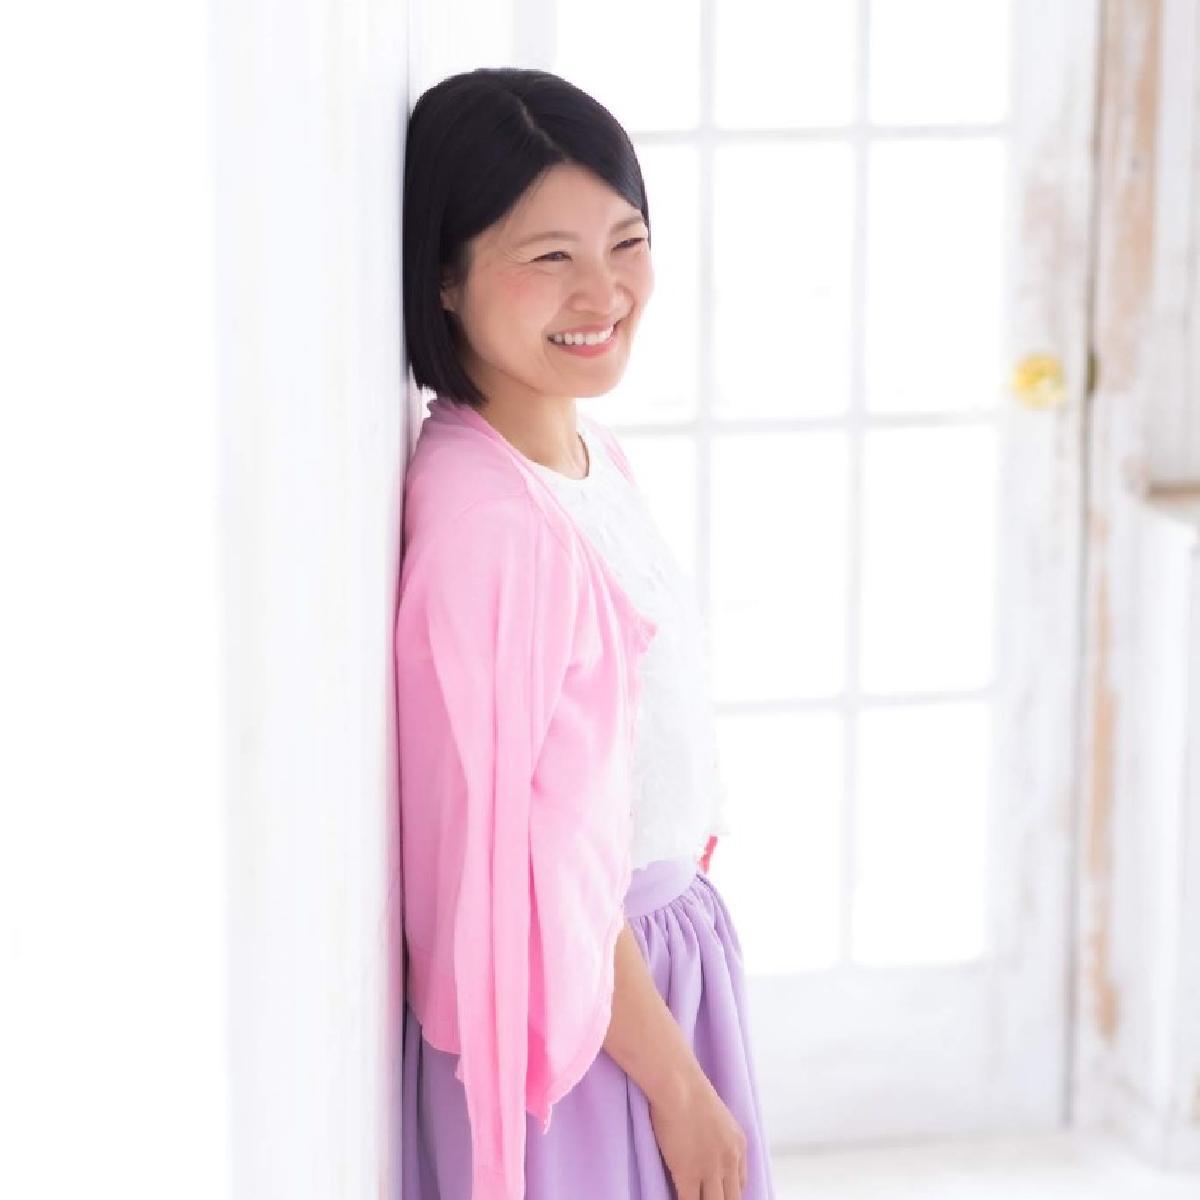 Online consultation for pregnant women in Japan